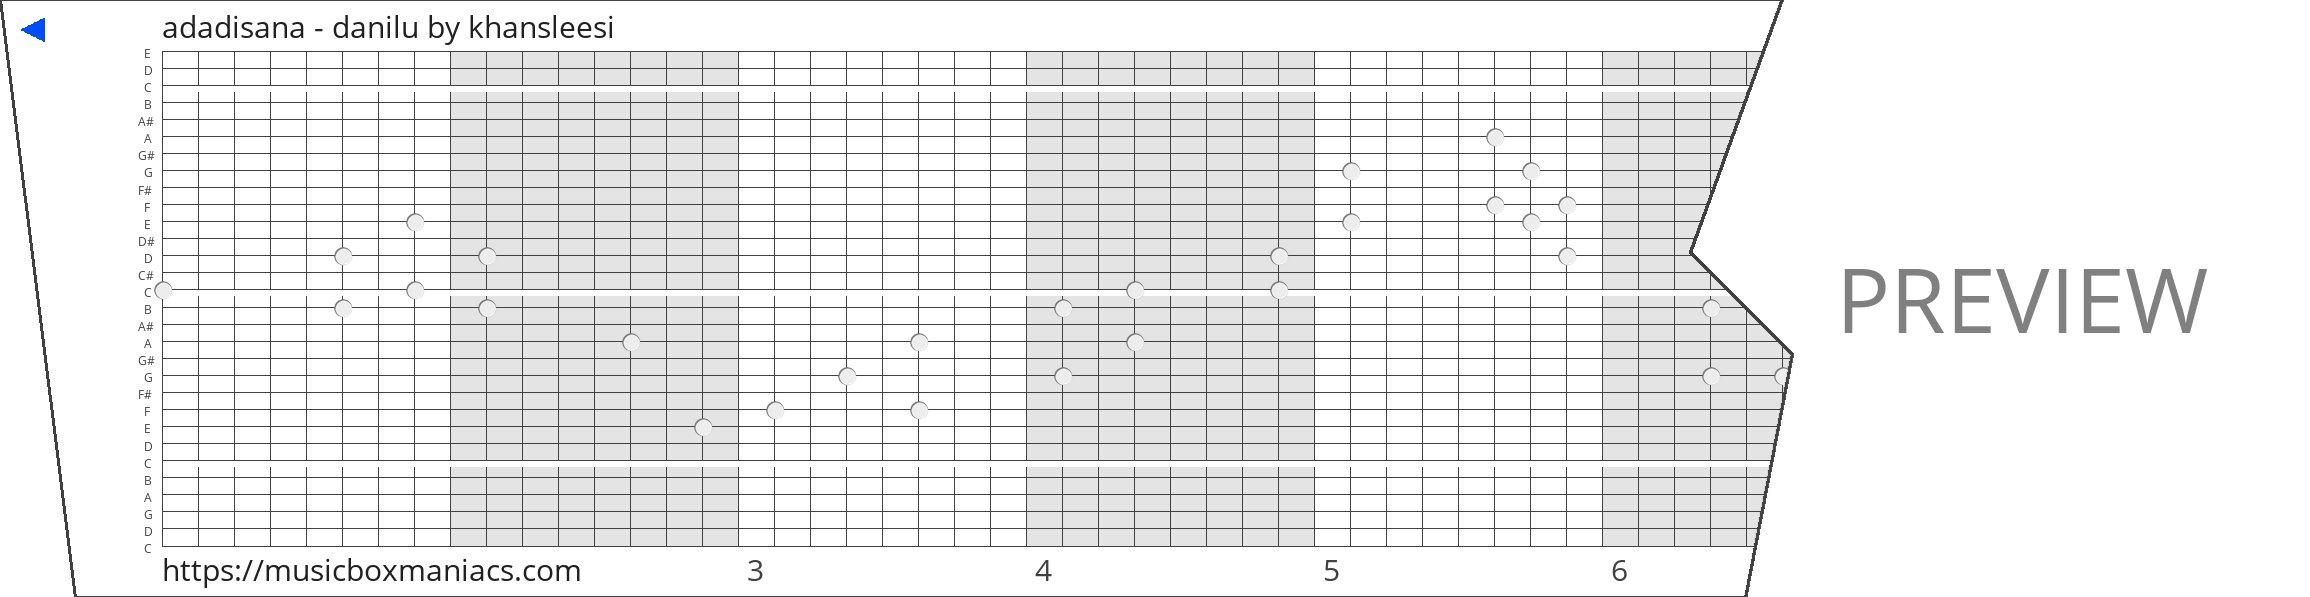 adadisana - danilu 30 note music box paper strip